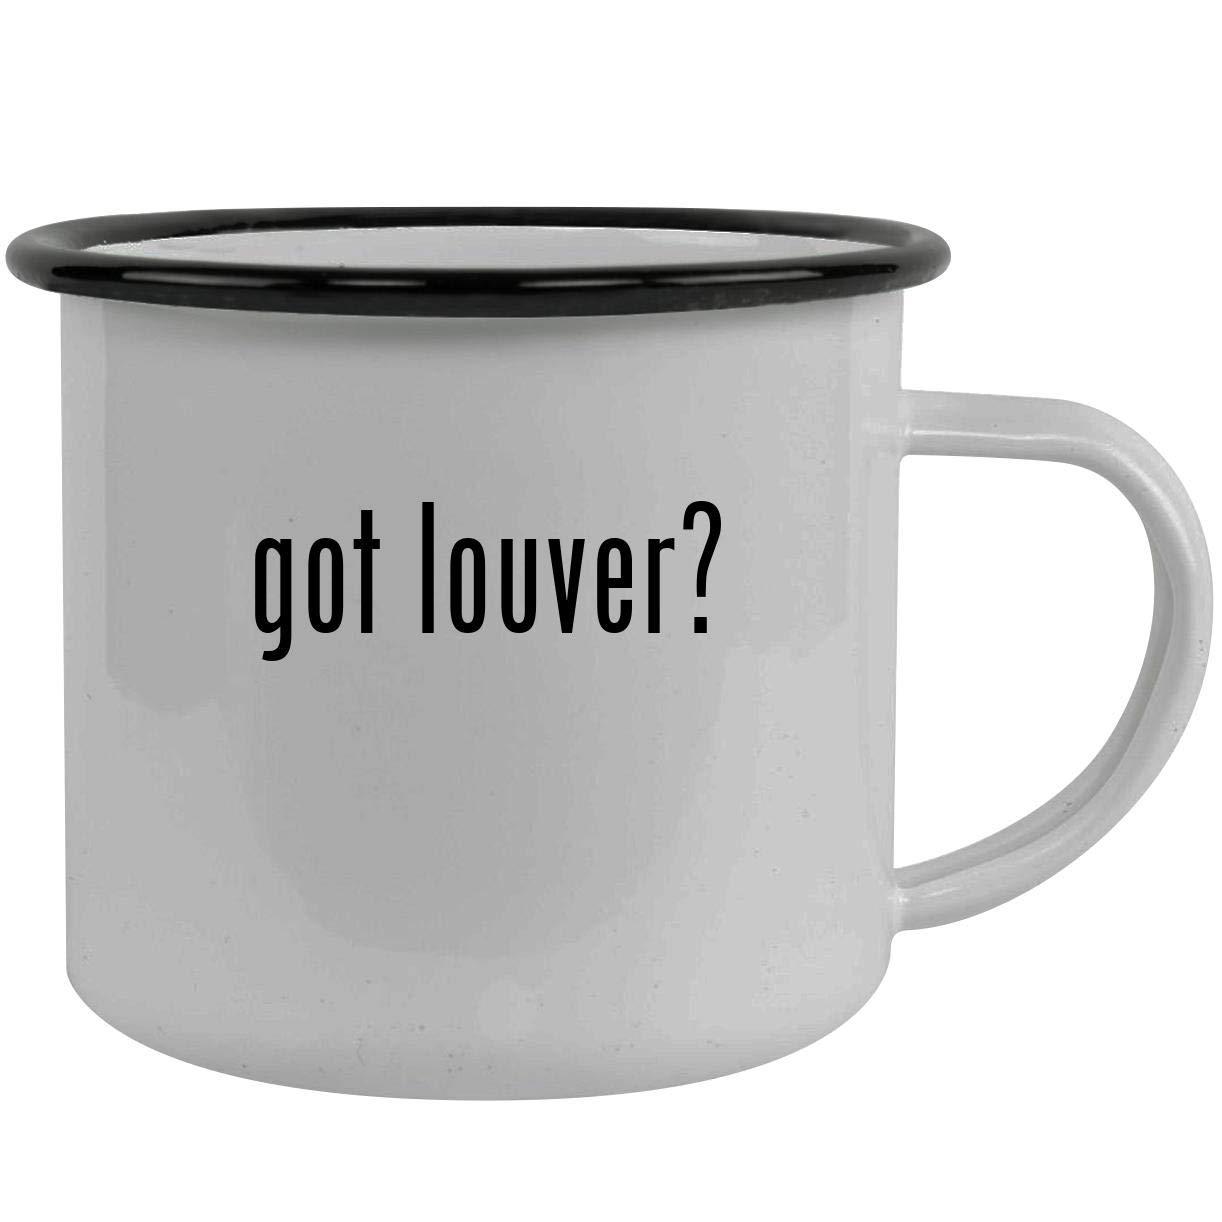 got louver? - Stainless Steel 12oz Camping Mug, Black